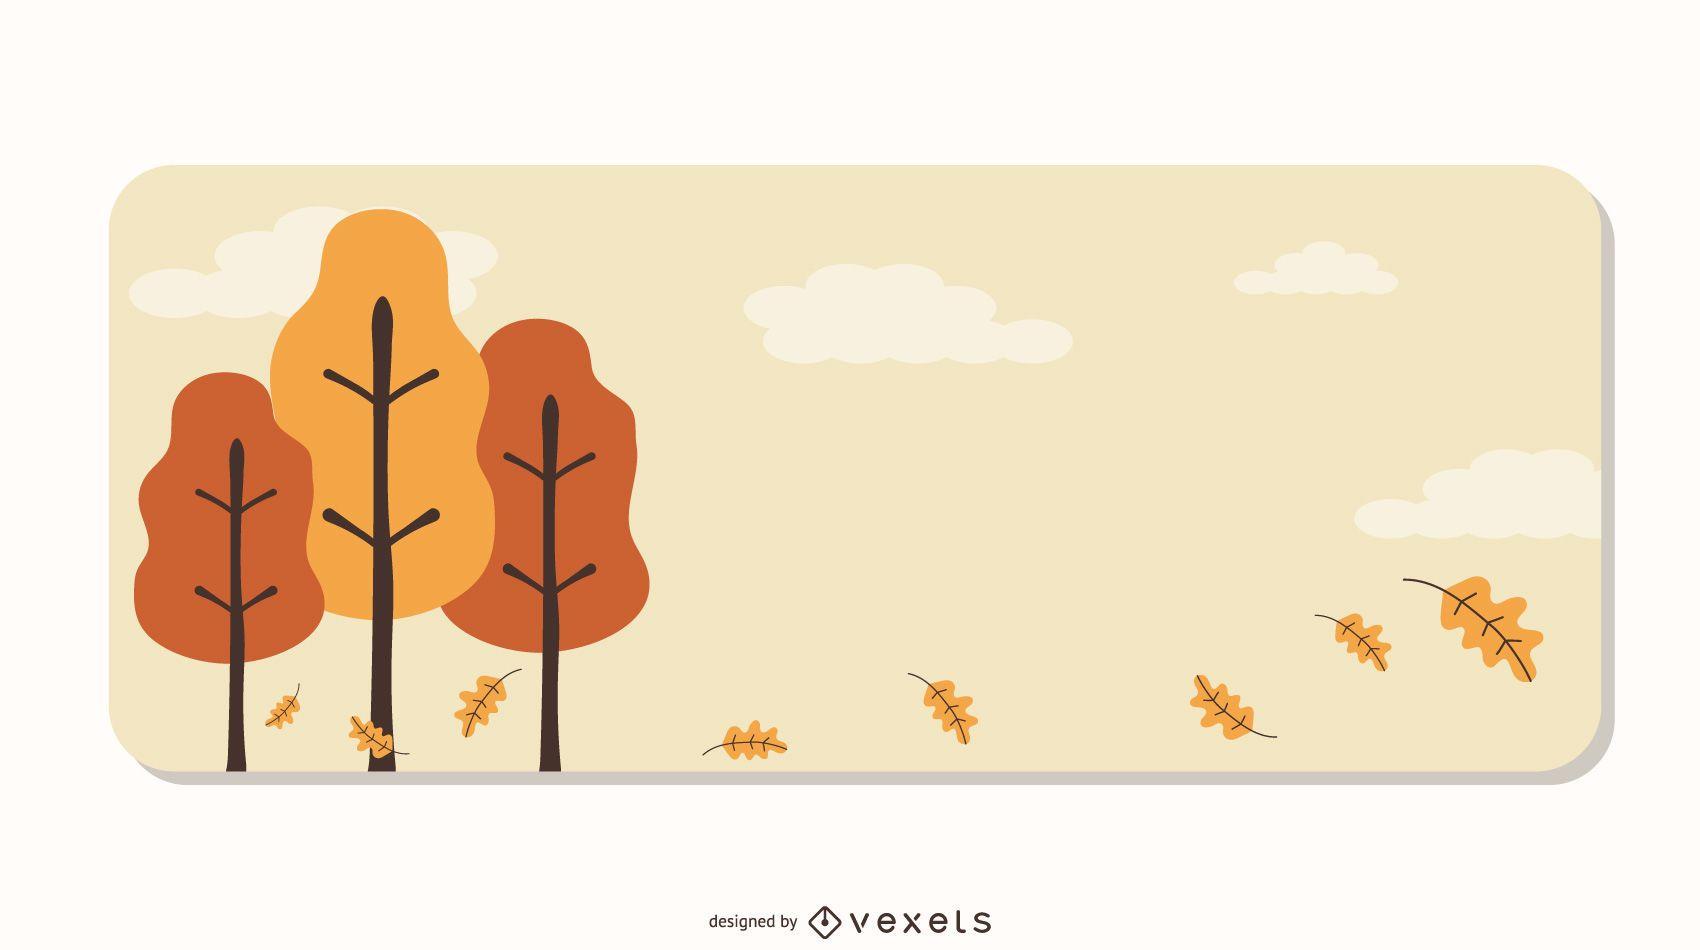 Diseño de vector de banner decorativo de árboles